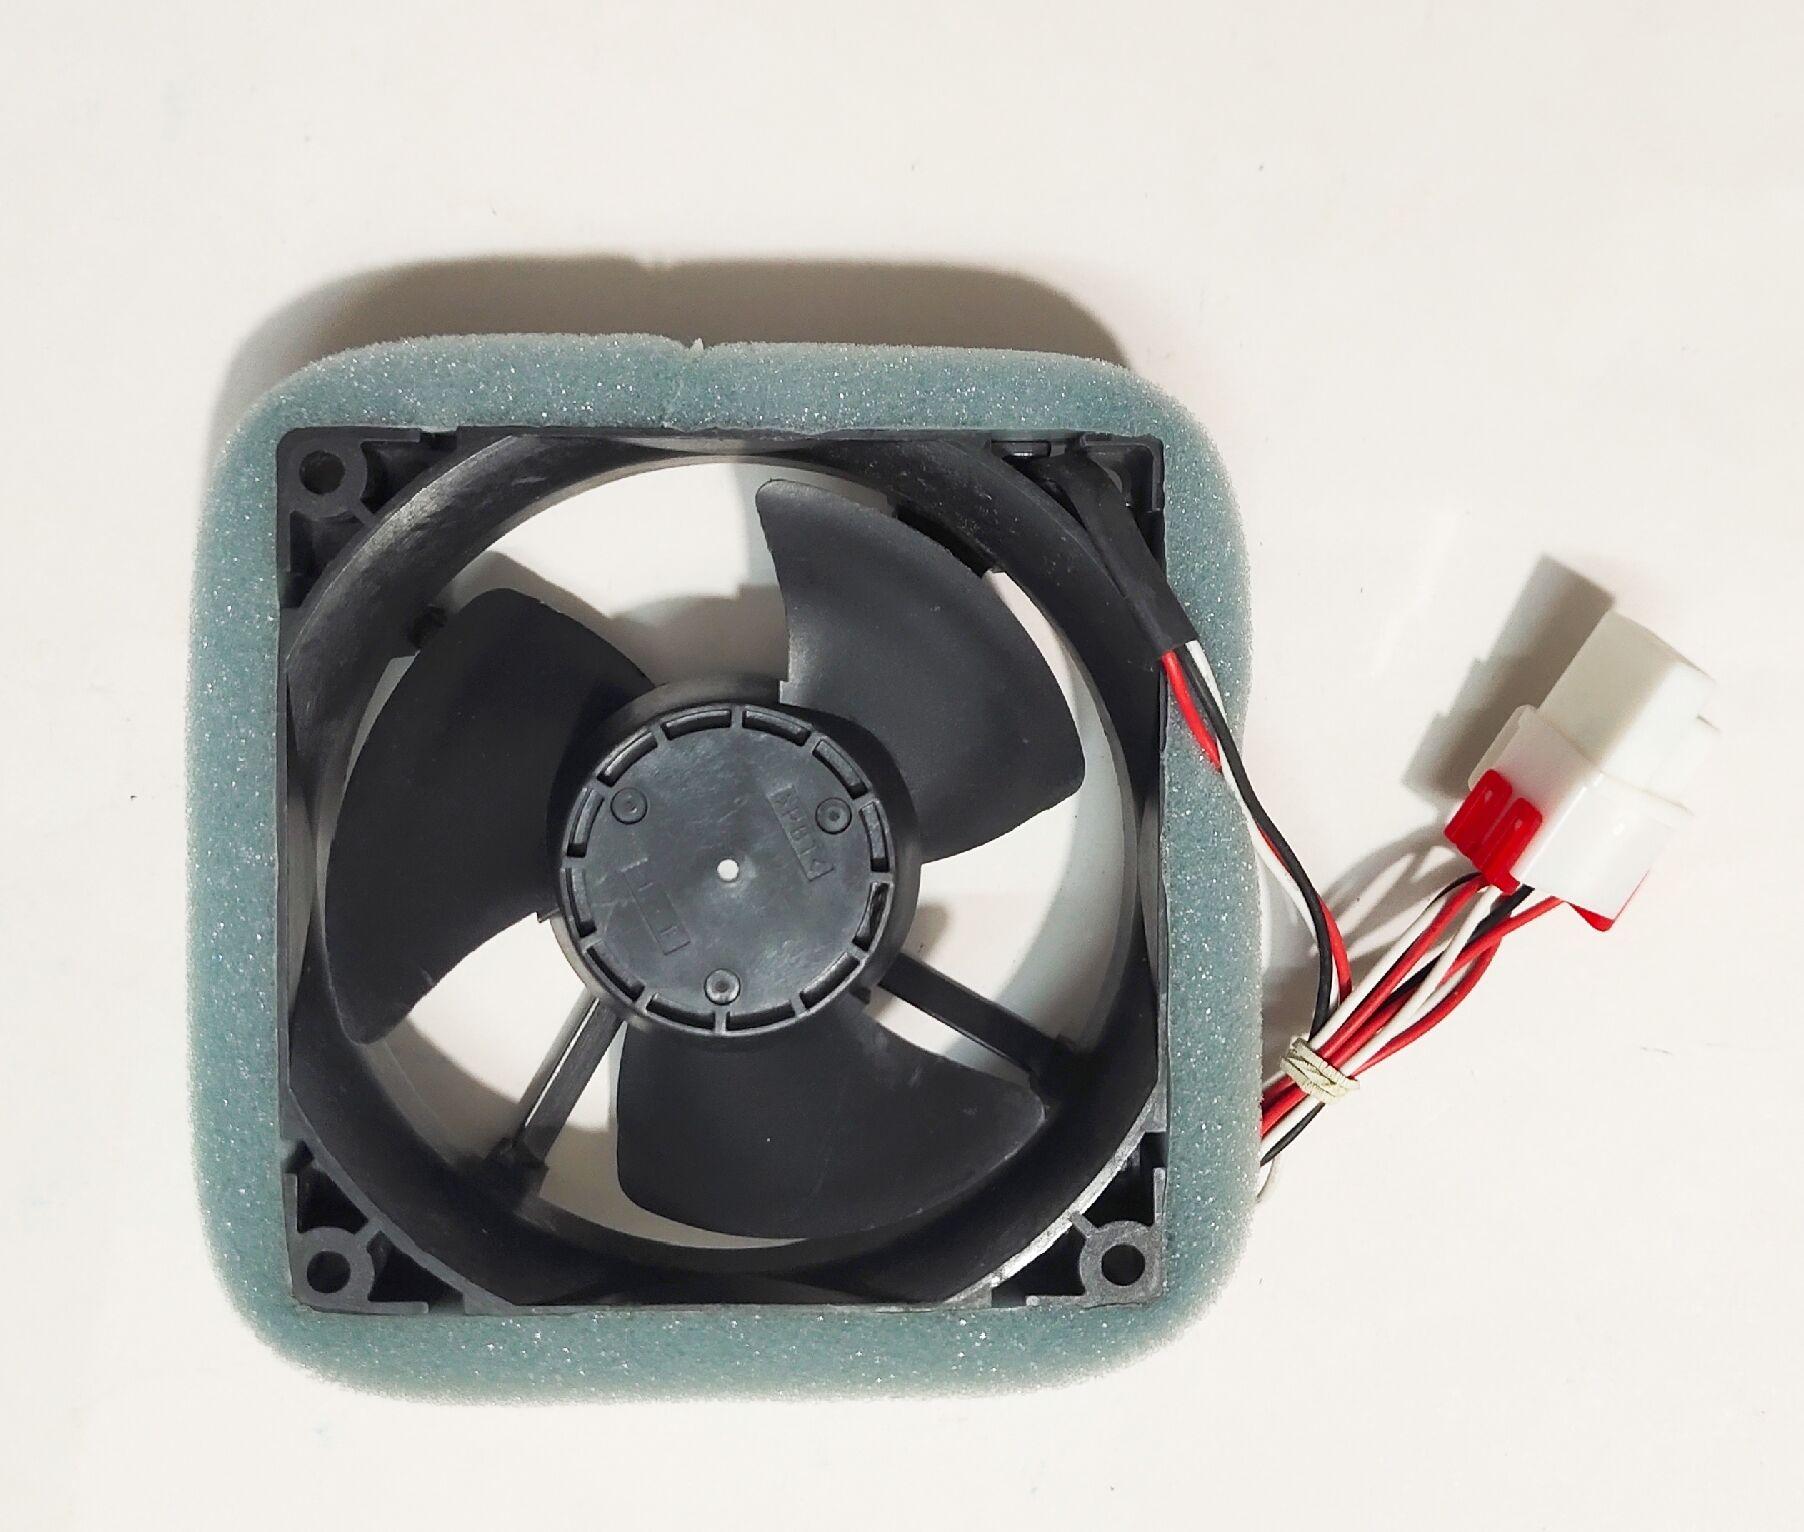 Охлаждающий вентилятор 9 см U92C12MS1B3-52 12В 0.16A водонепроницаемый кулер